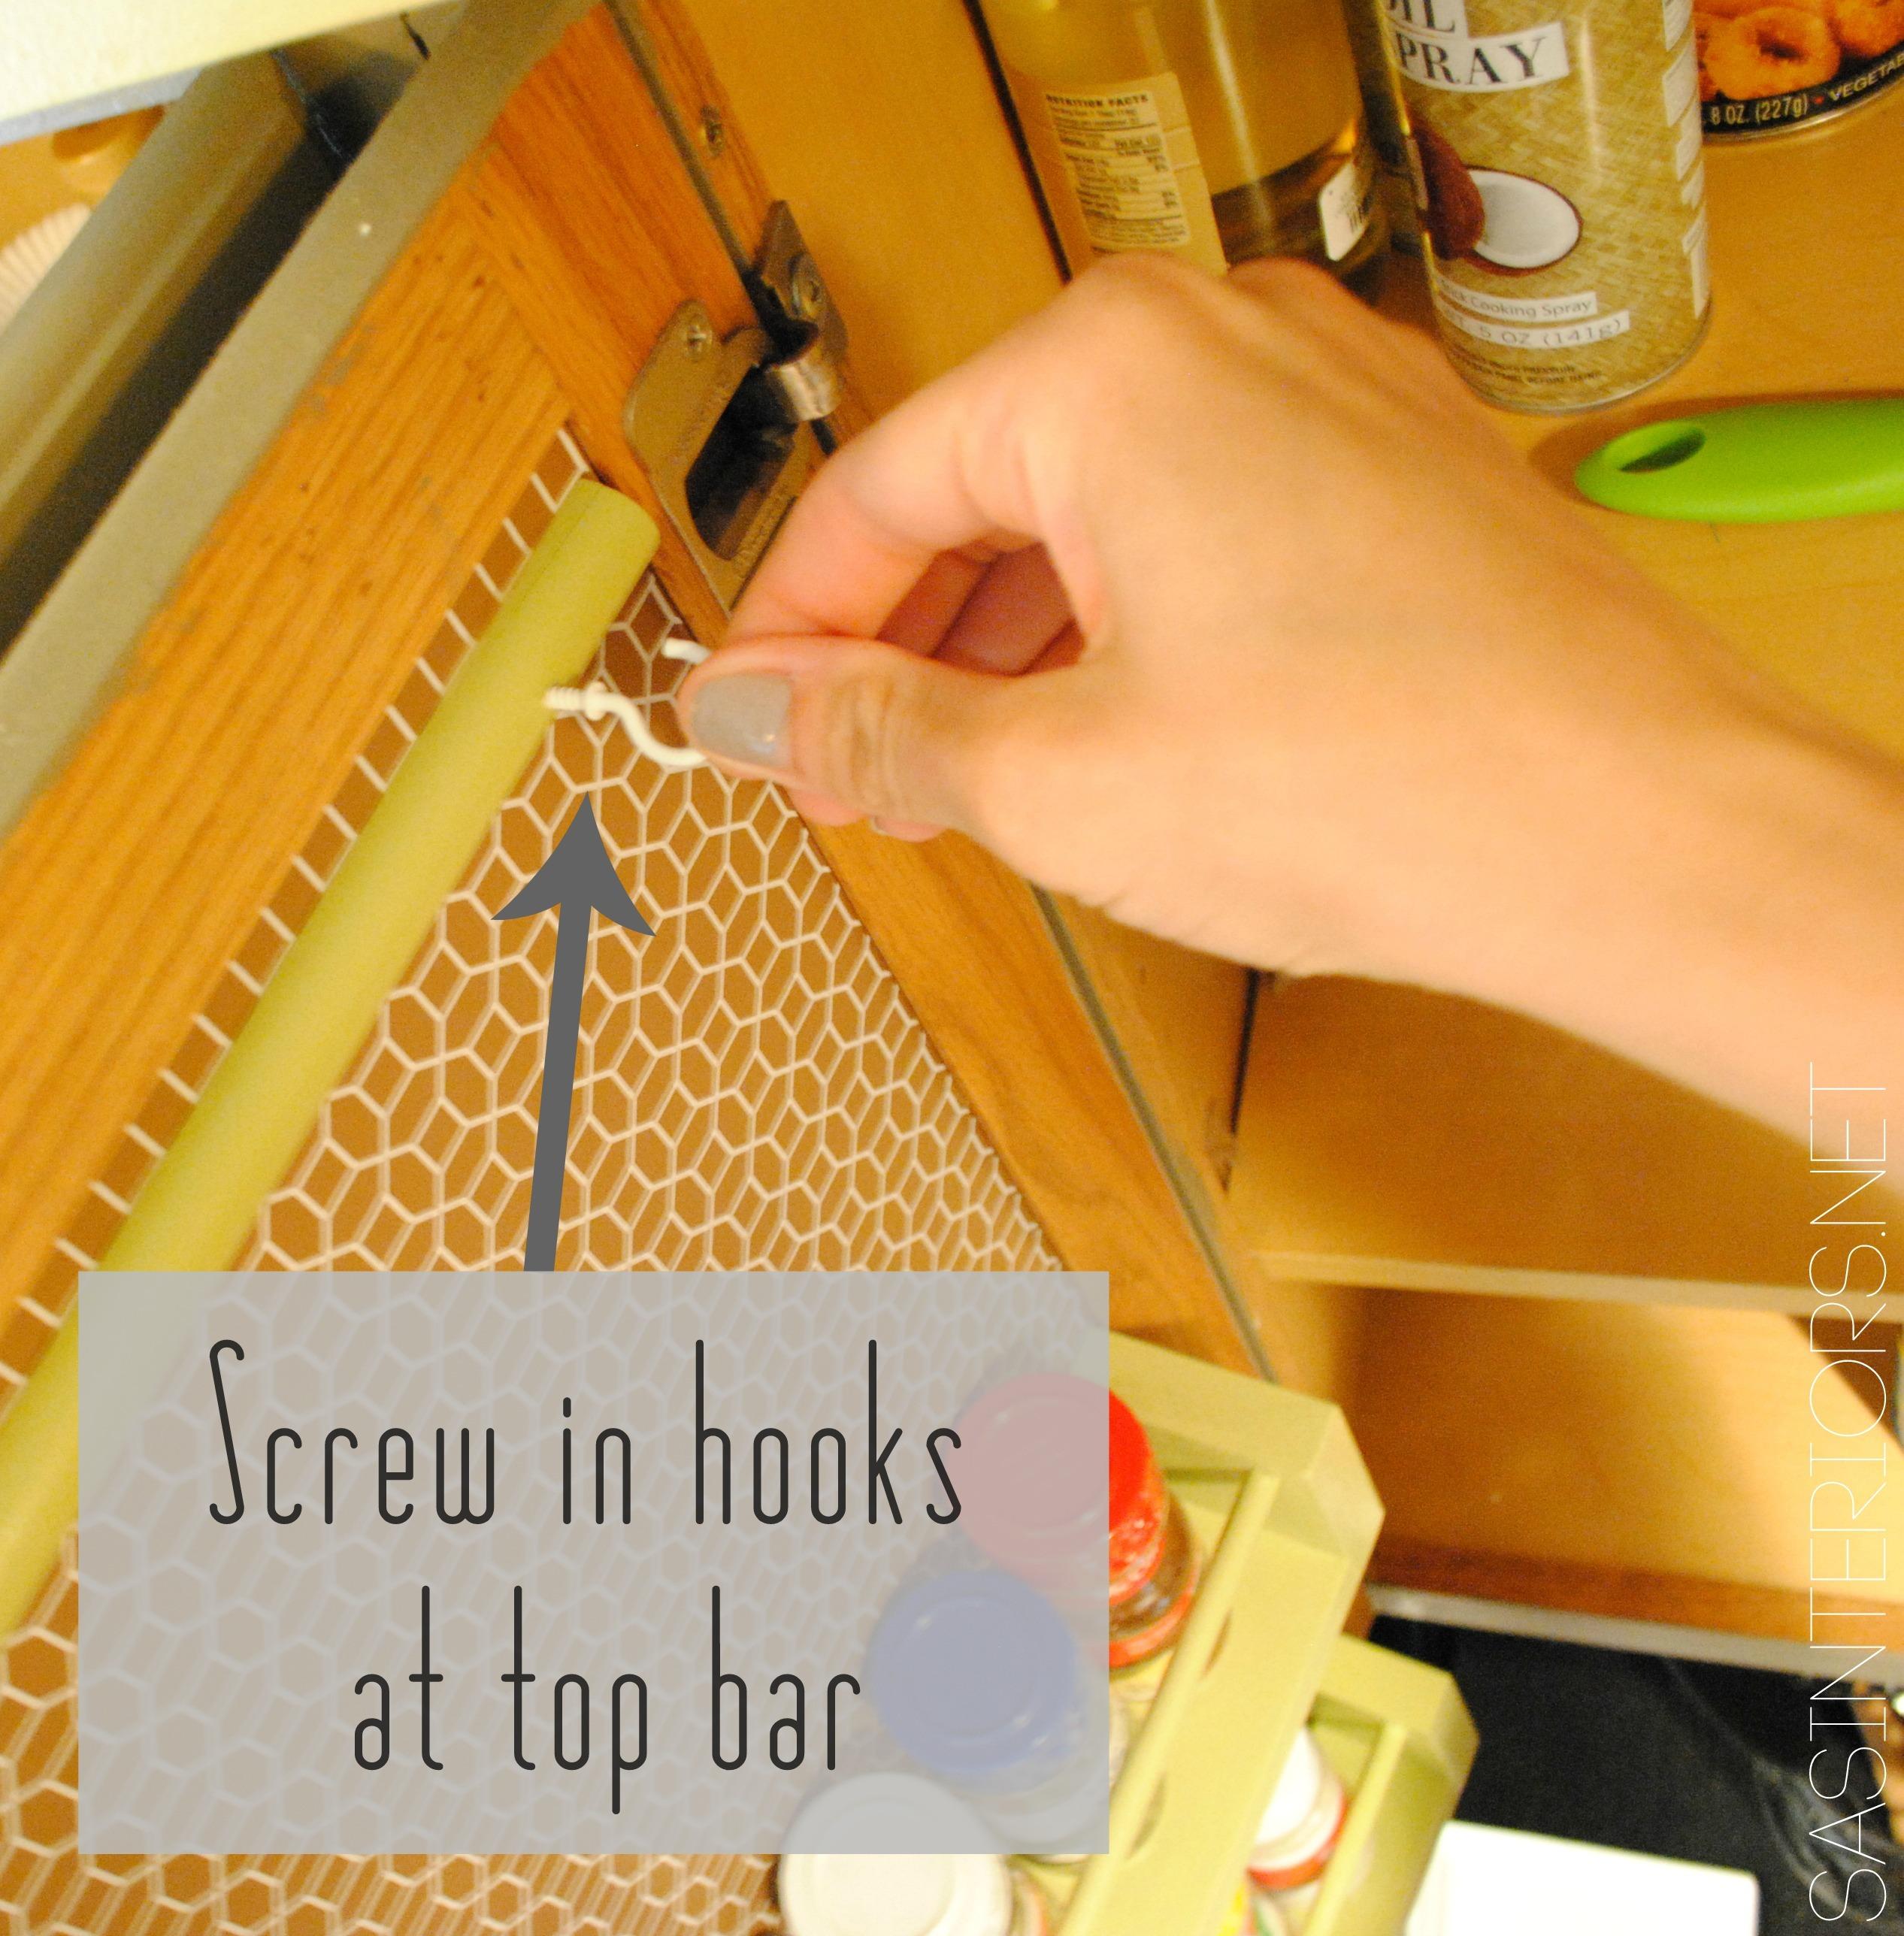 Kitchen Organization Ideas For The Inside Of The Cabinet Doors Jenna Burger Design Llc